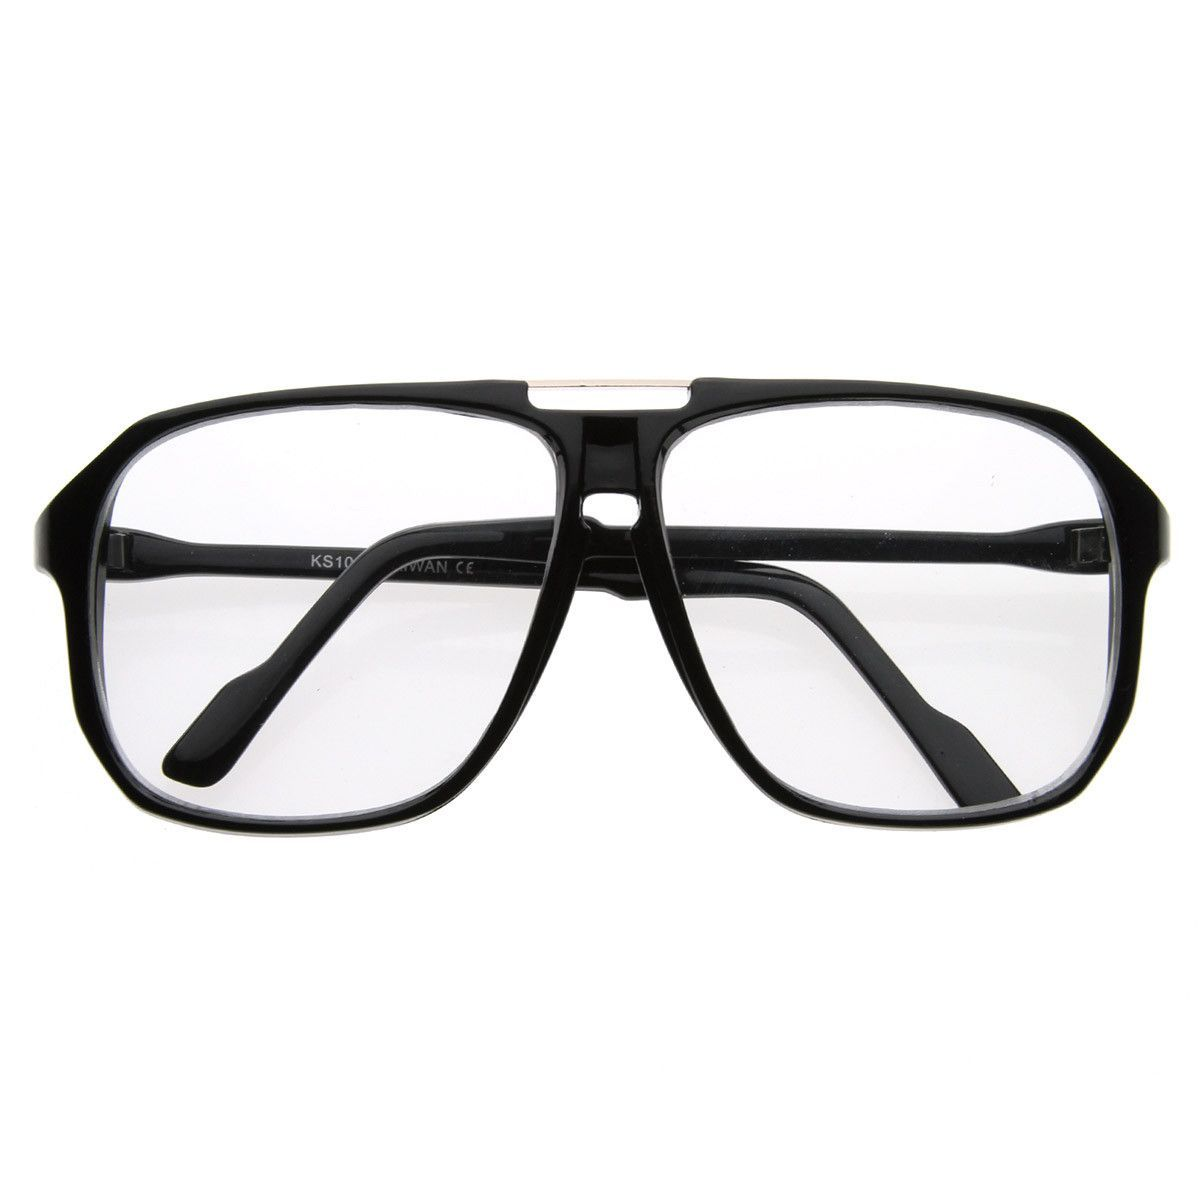 3f3cbb5ce547 Square Shaped Plastic Aviator Clear Lens Glasses Eyewear with Metal Top  Bridge  frame  summer  bold  sunglassla  cateye  oversized  clear   sunglasses ...